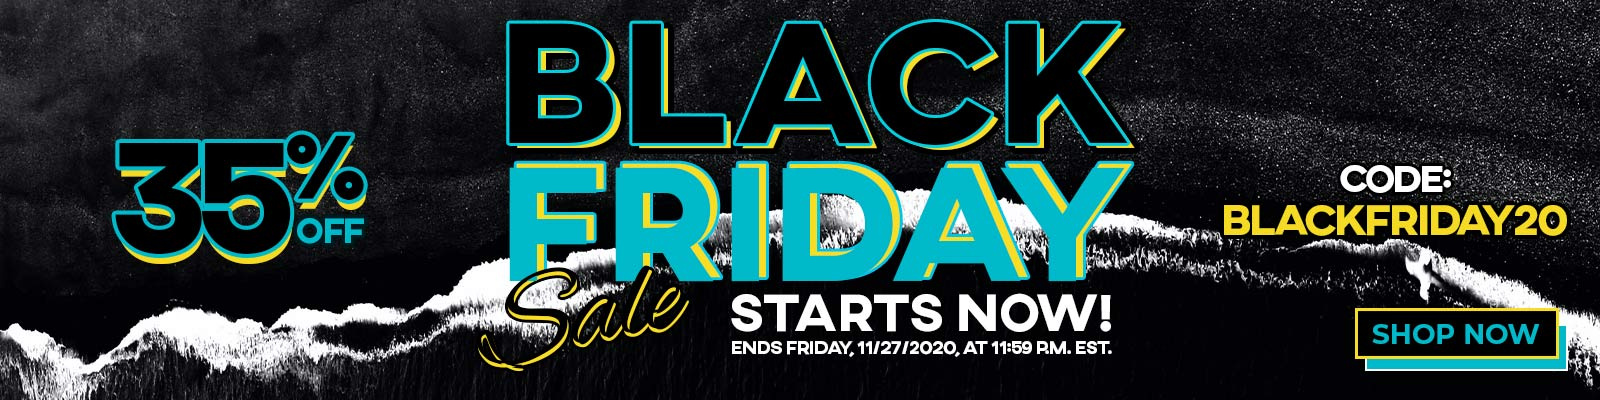 Black Friday CBD Sale 35% Off + Free Shipping Code: BLACKFRIDAY20